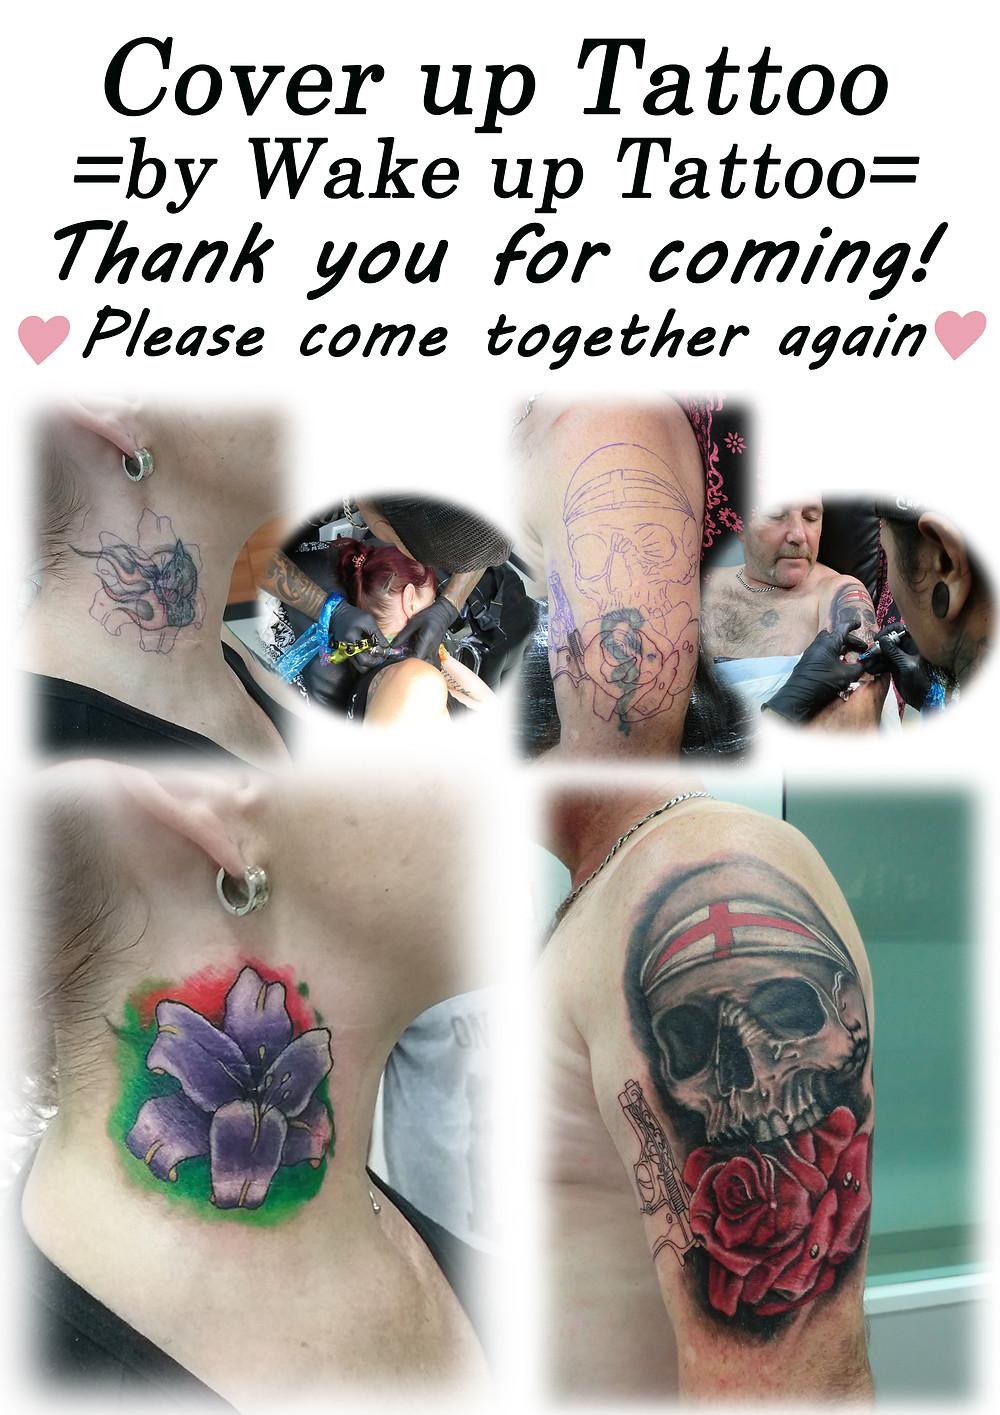 Cover up Tattoo by Wake up Tattoo Phuket